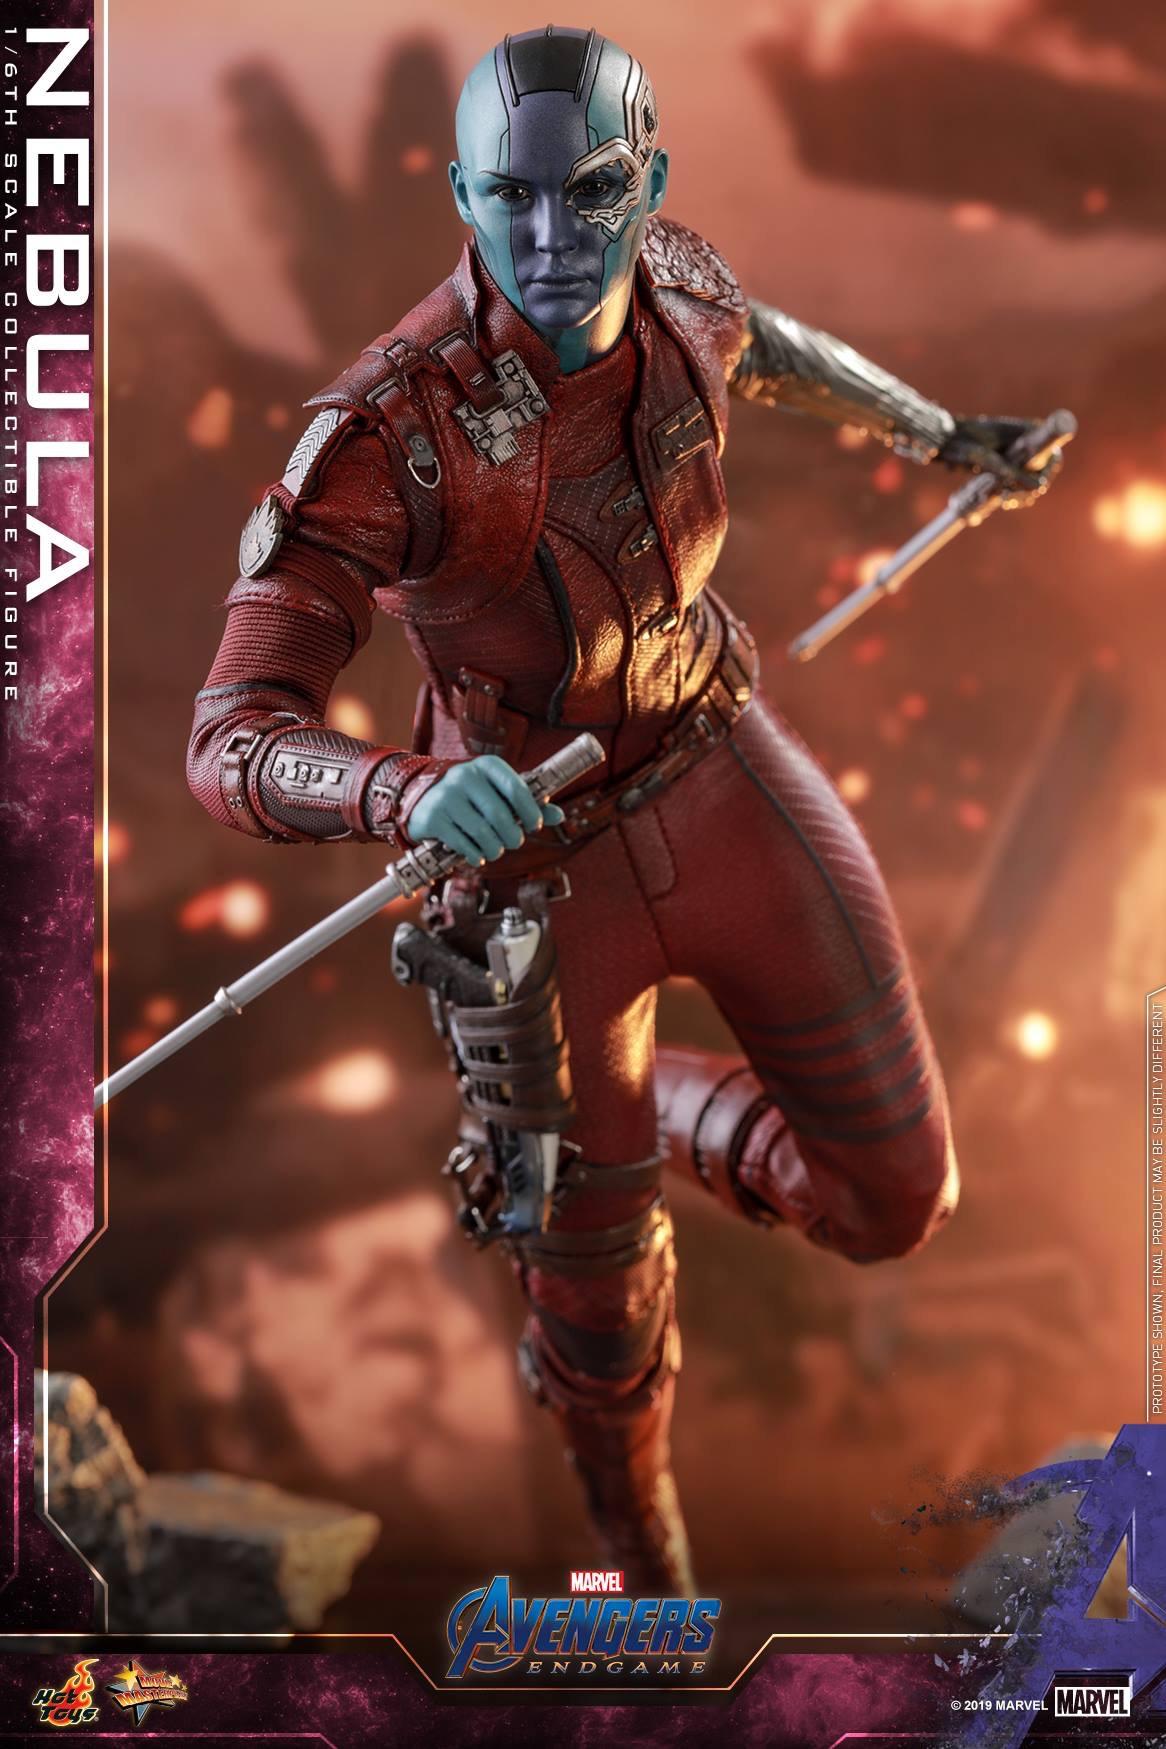 Avengers: Endgame – Nebula Collectible Figure Coming Soon